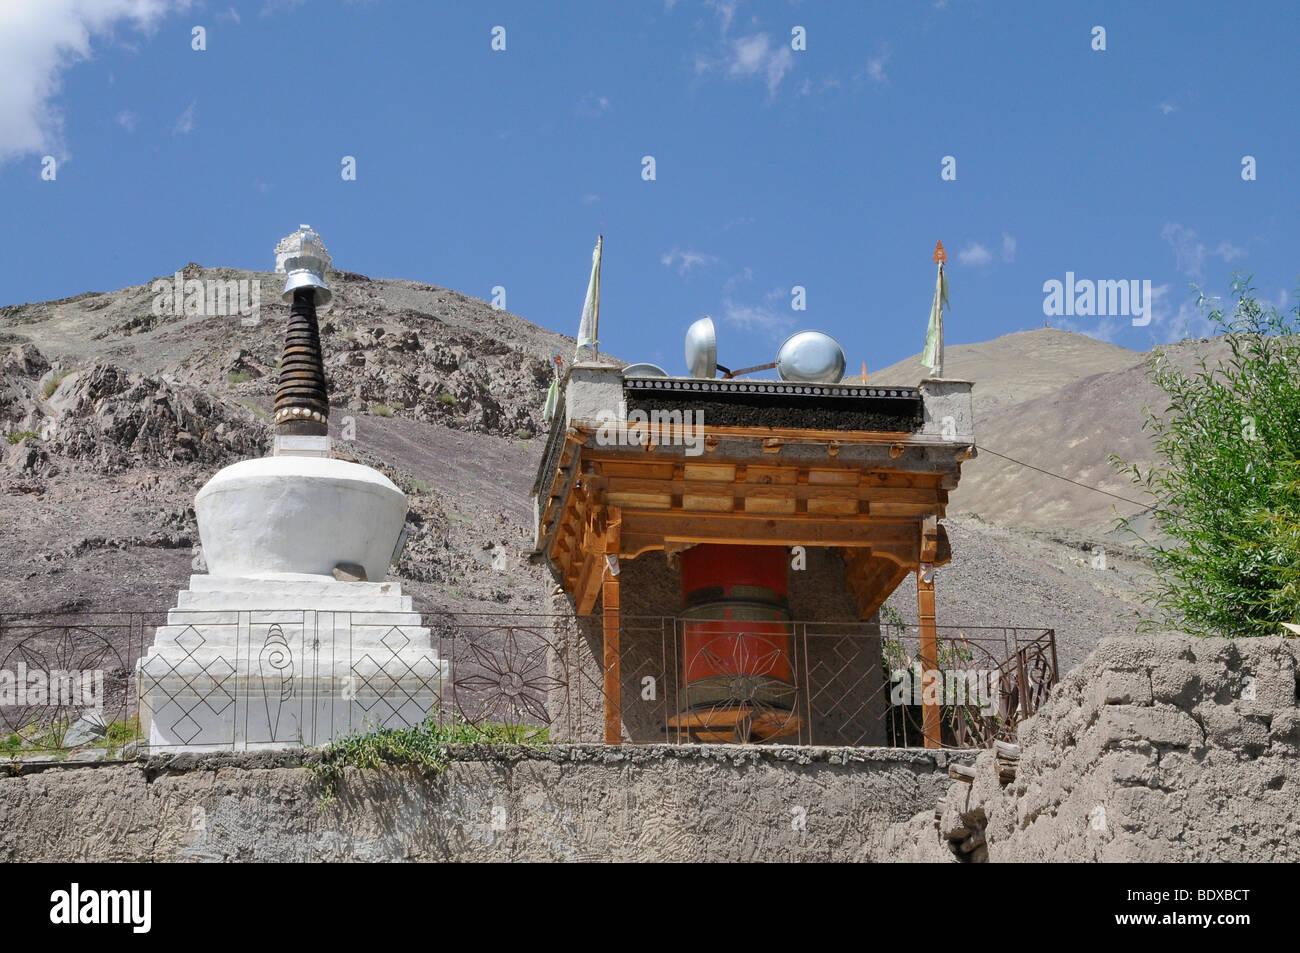 Windgetriebene Mani-Mühle mit Stupa in Stok, Ladakh, Nordindien, Indien, Himalaya, Asien Stockbild